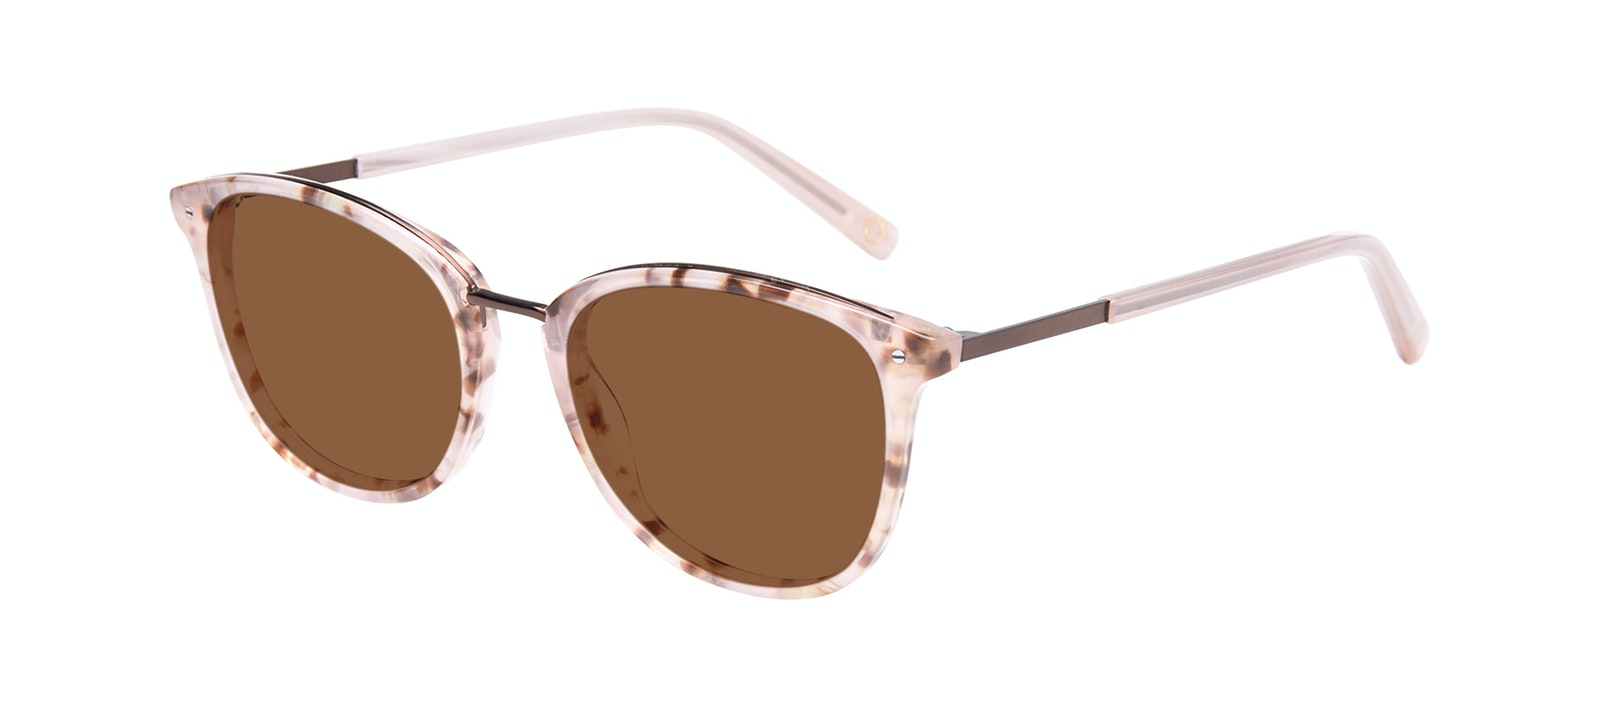 Affordable Fashion Glasses Square Round Sunglasses Women Bella Blush Tortie Tilt